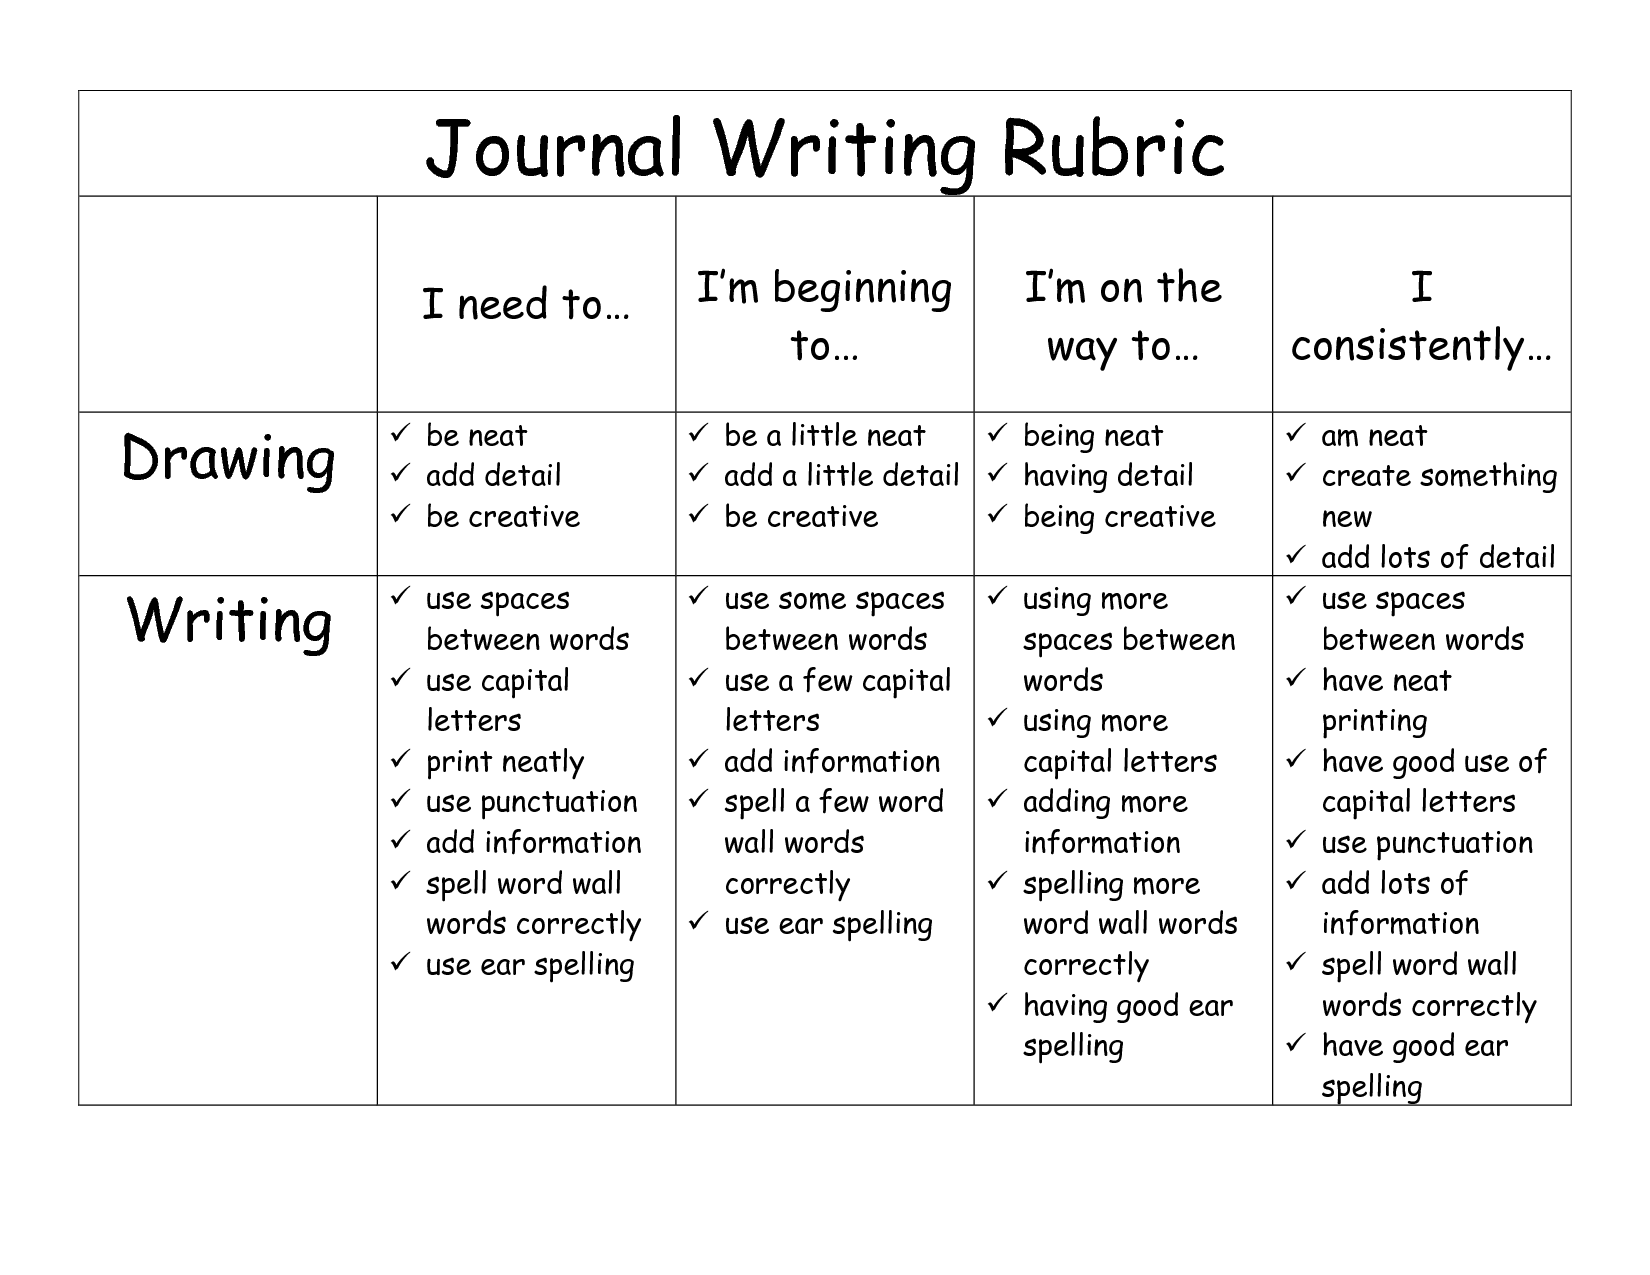 Journal Writing Rubric